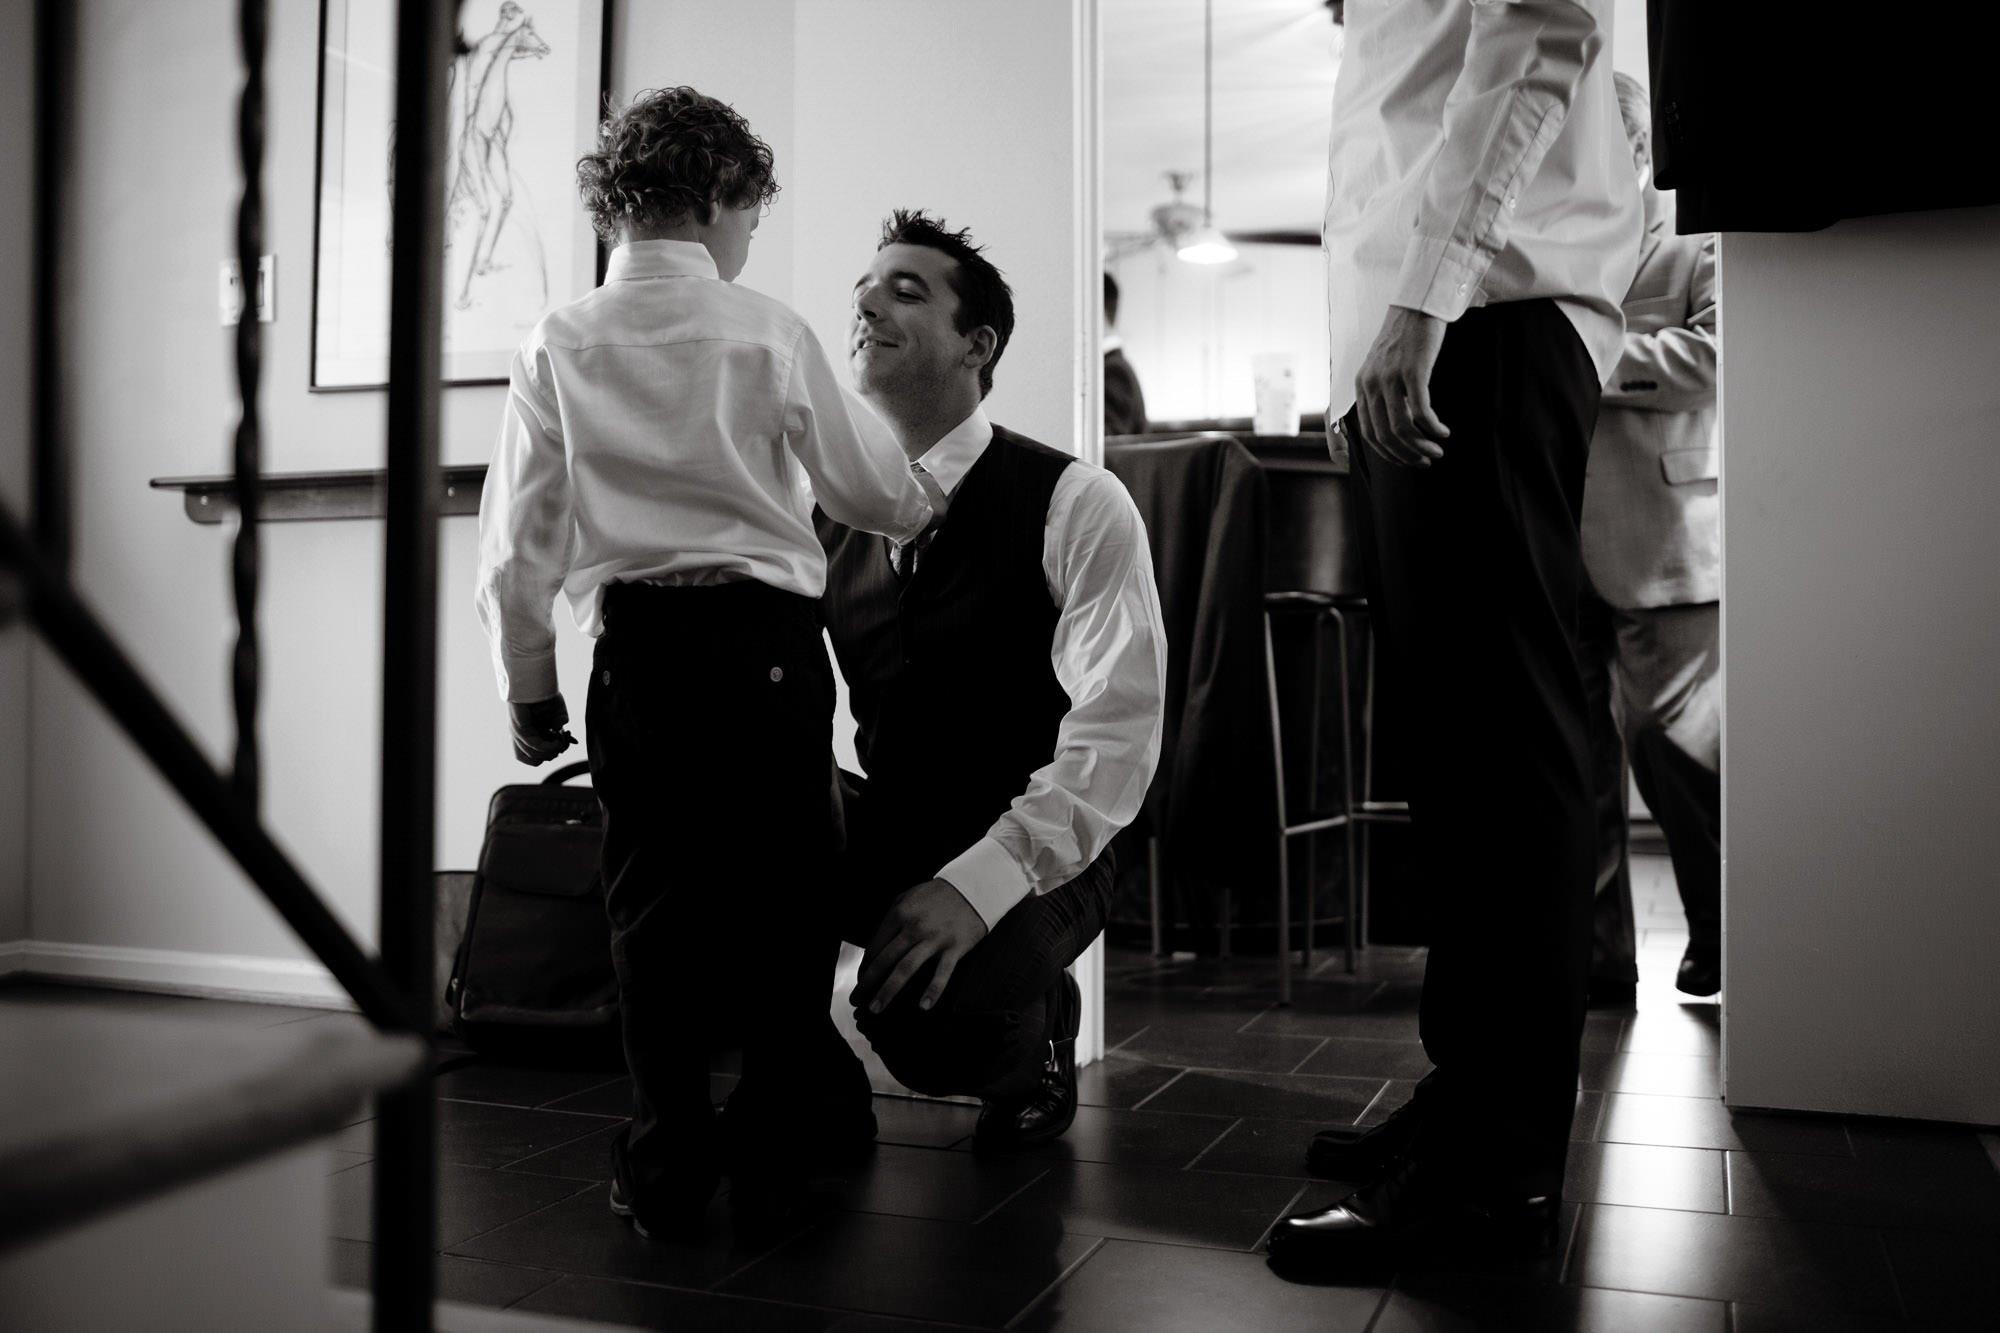 Groomsmen get ready before the wedding ceremony.